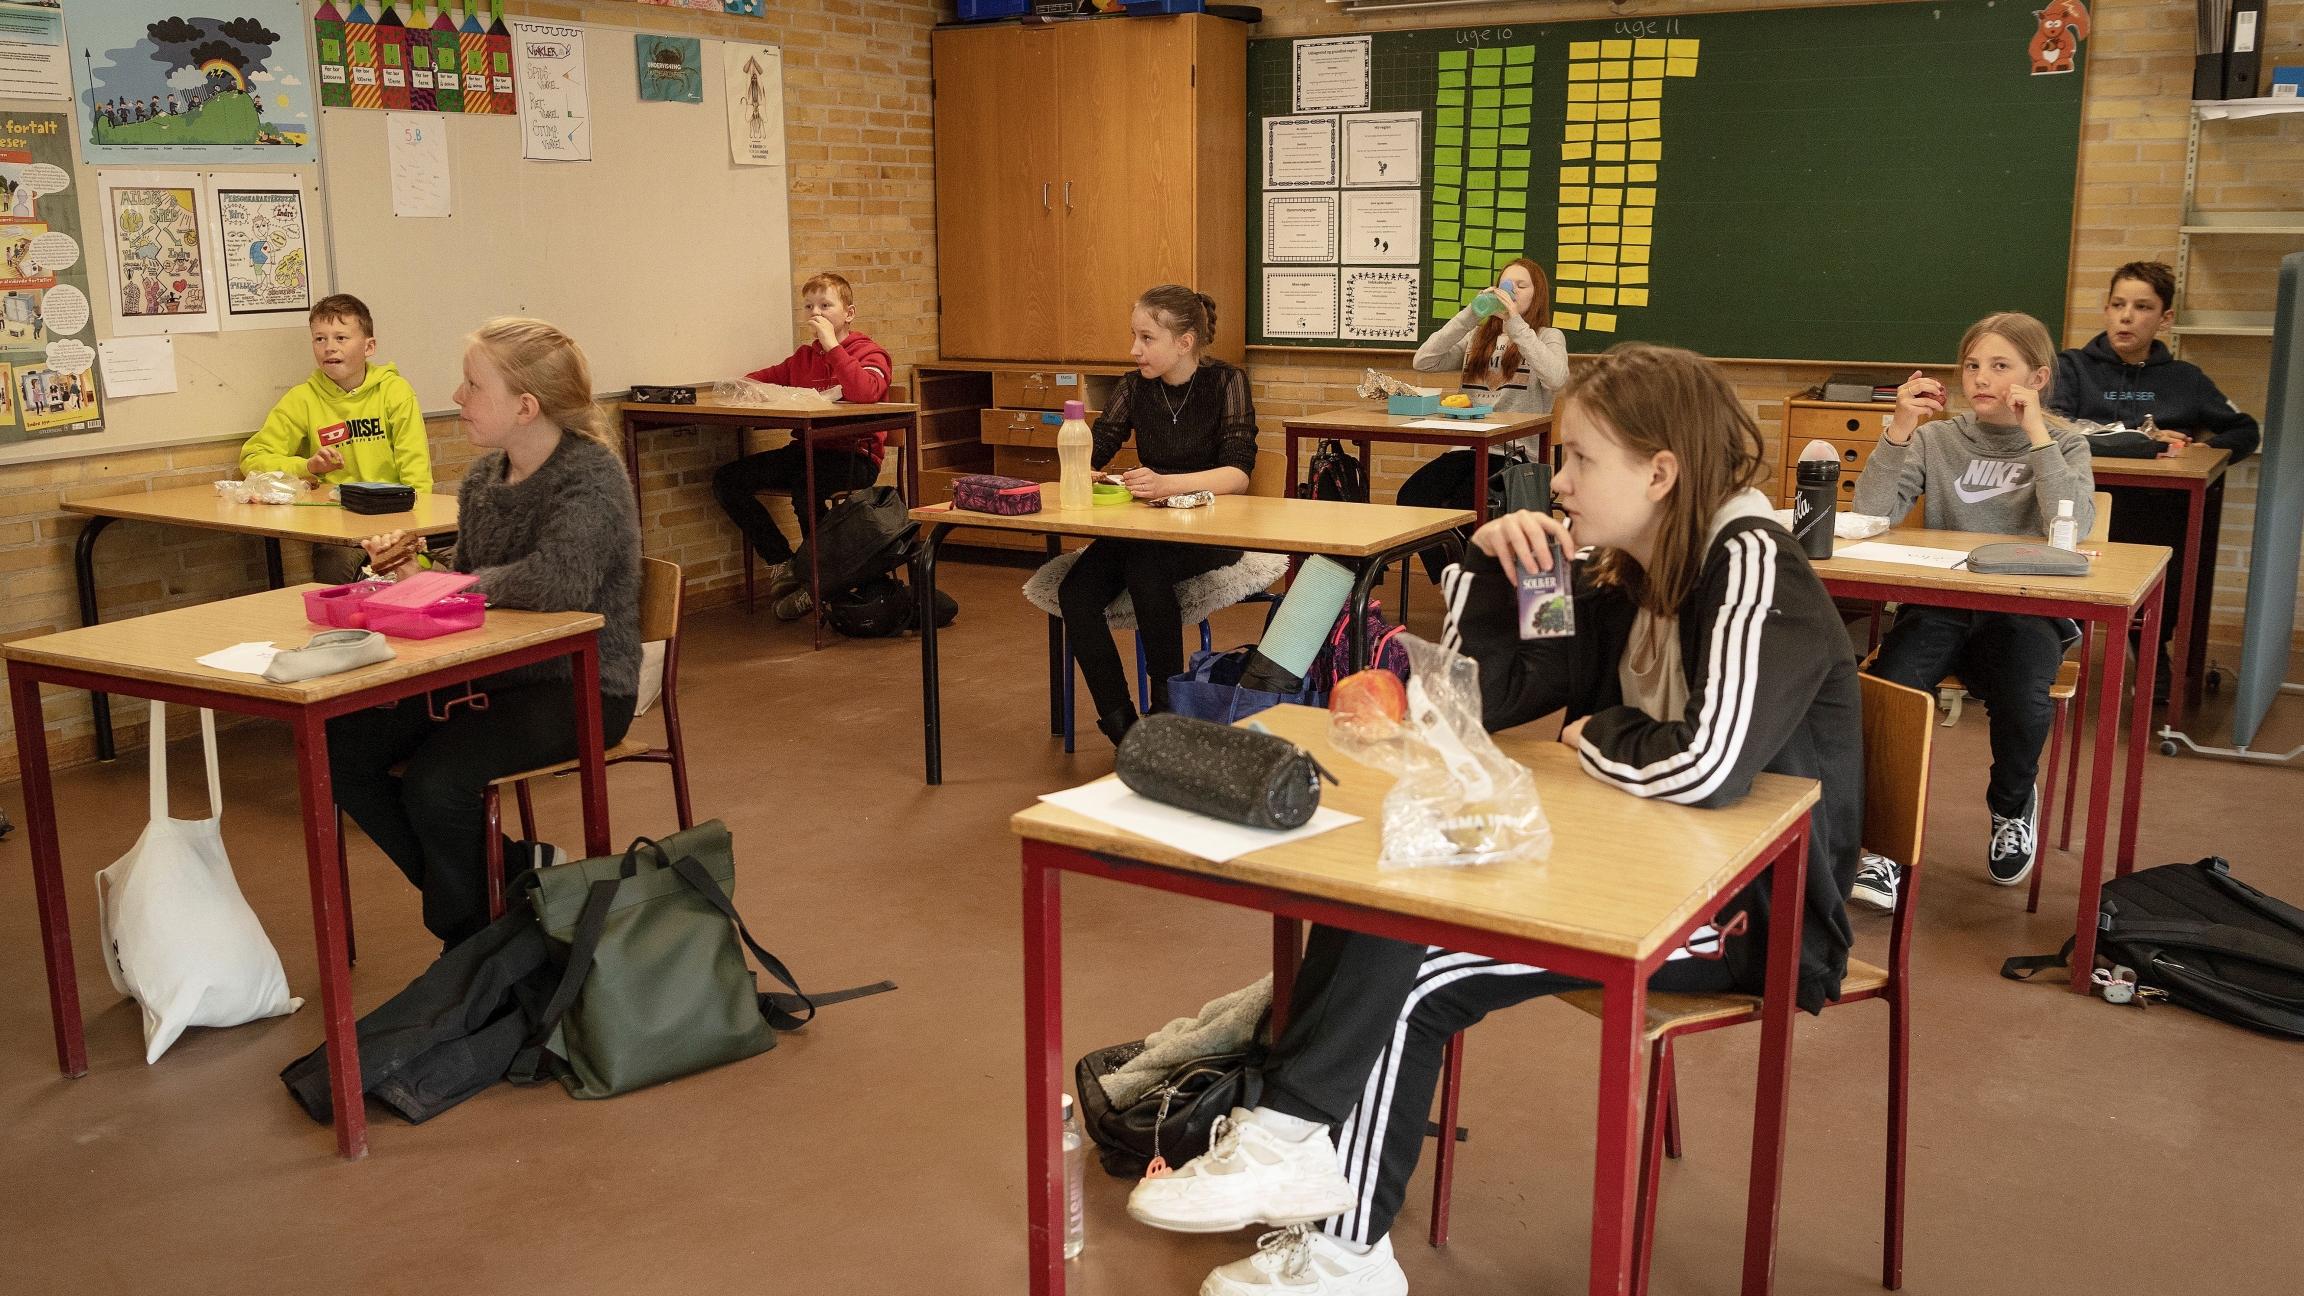 Pupils are seen during lunch break at the Korshoejskolen school, after it reopened following the lockdown due to the coronavirus disease (COVID-19) spread, in Randers,Denmark, April 15, 2020.